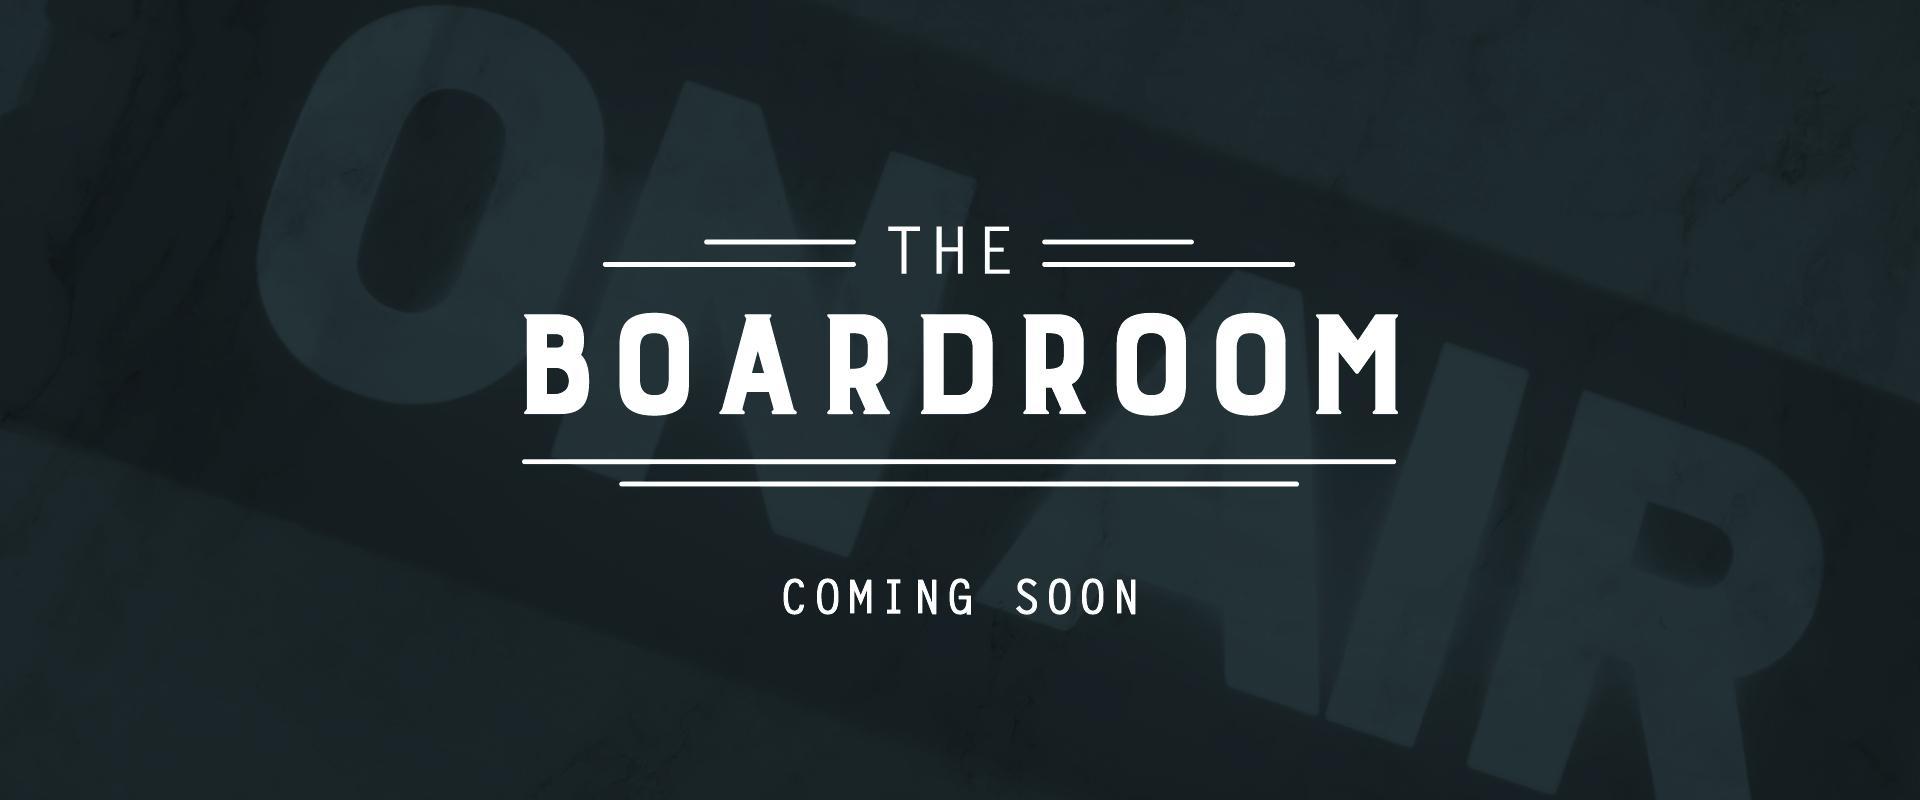 The Boardroom Coming Soon